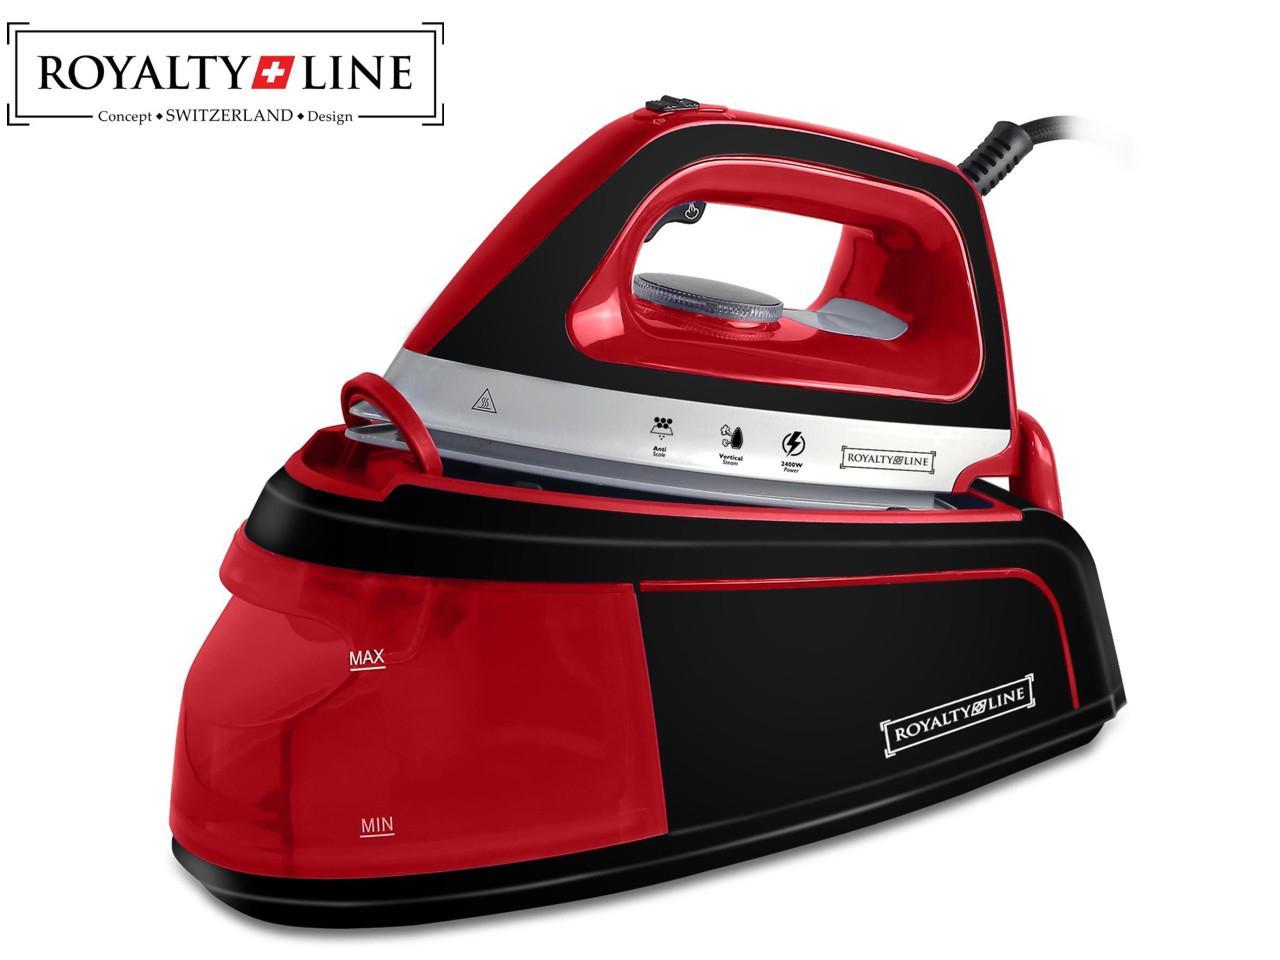 ROYALTY LINE RL-DBST-2300 RED